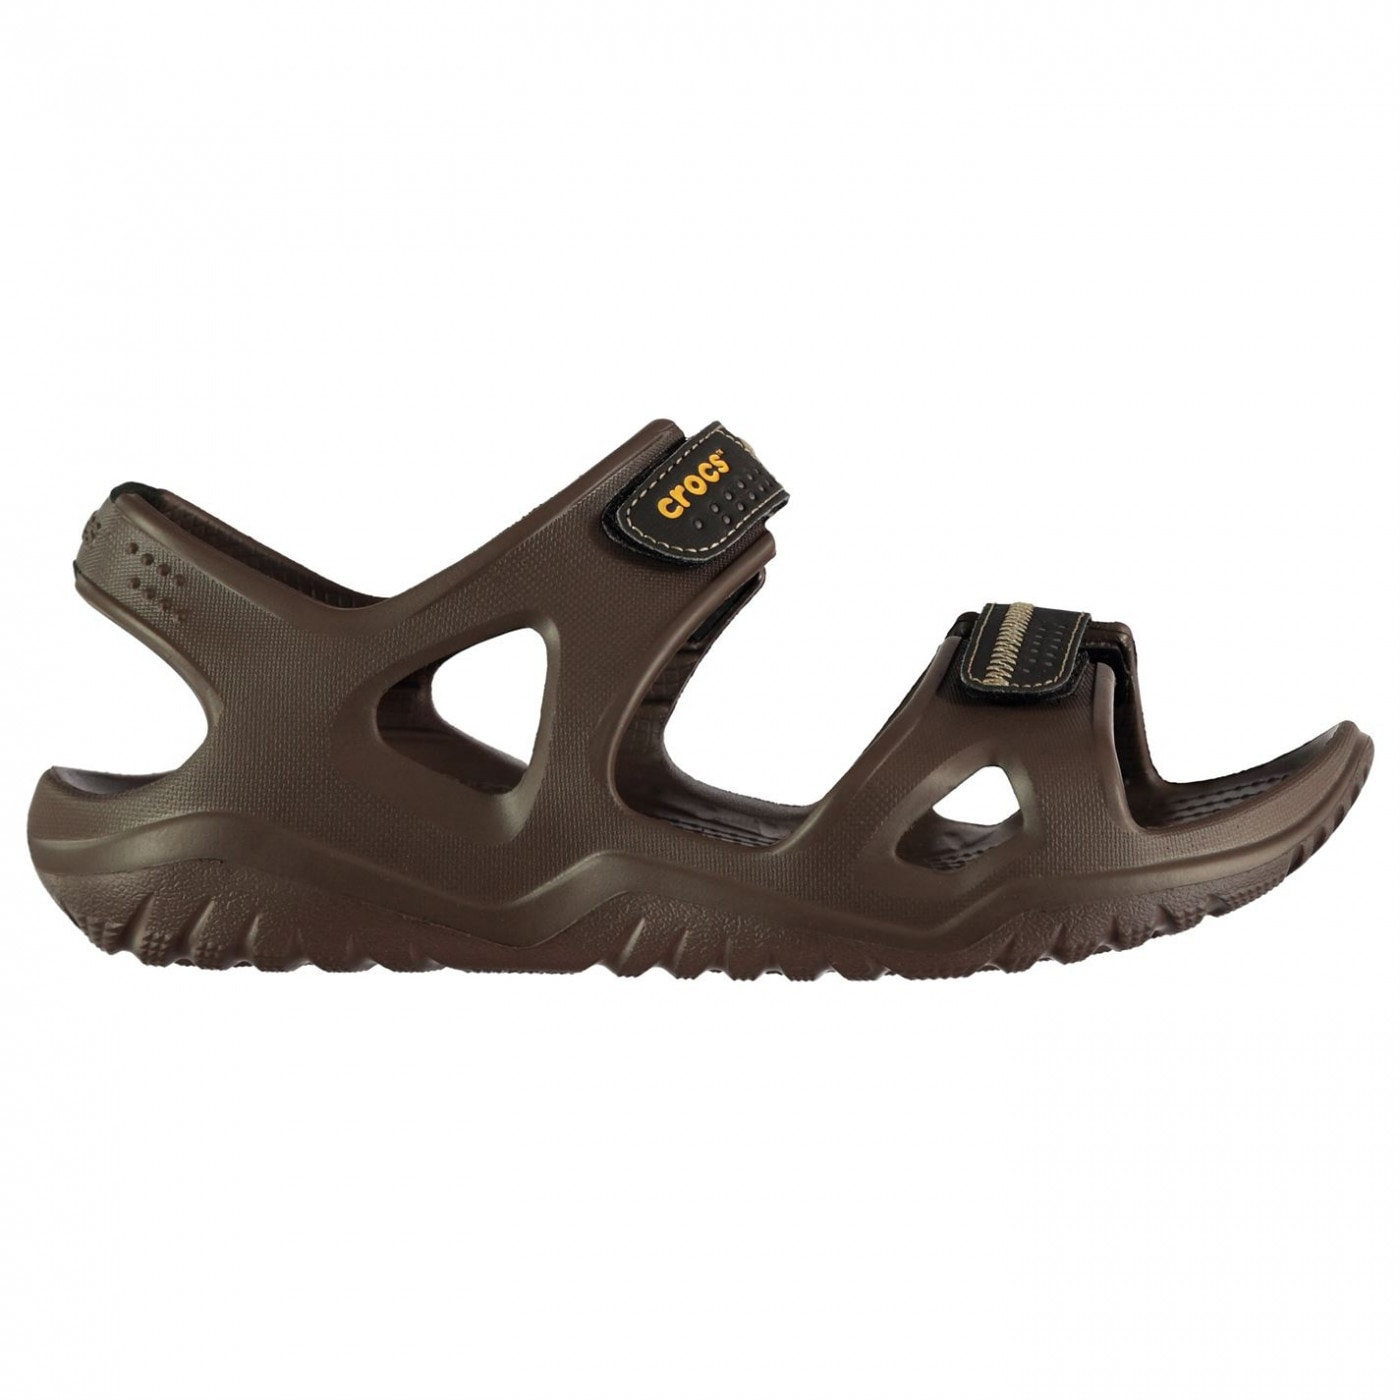 Crocs Swiftwater Sn93